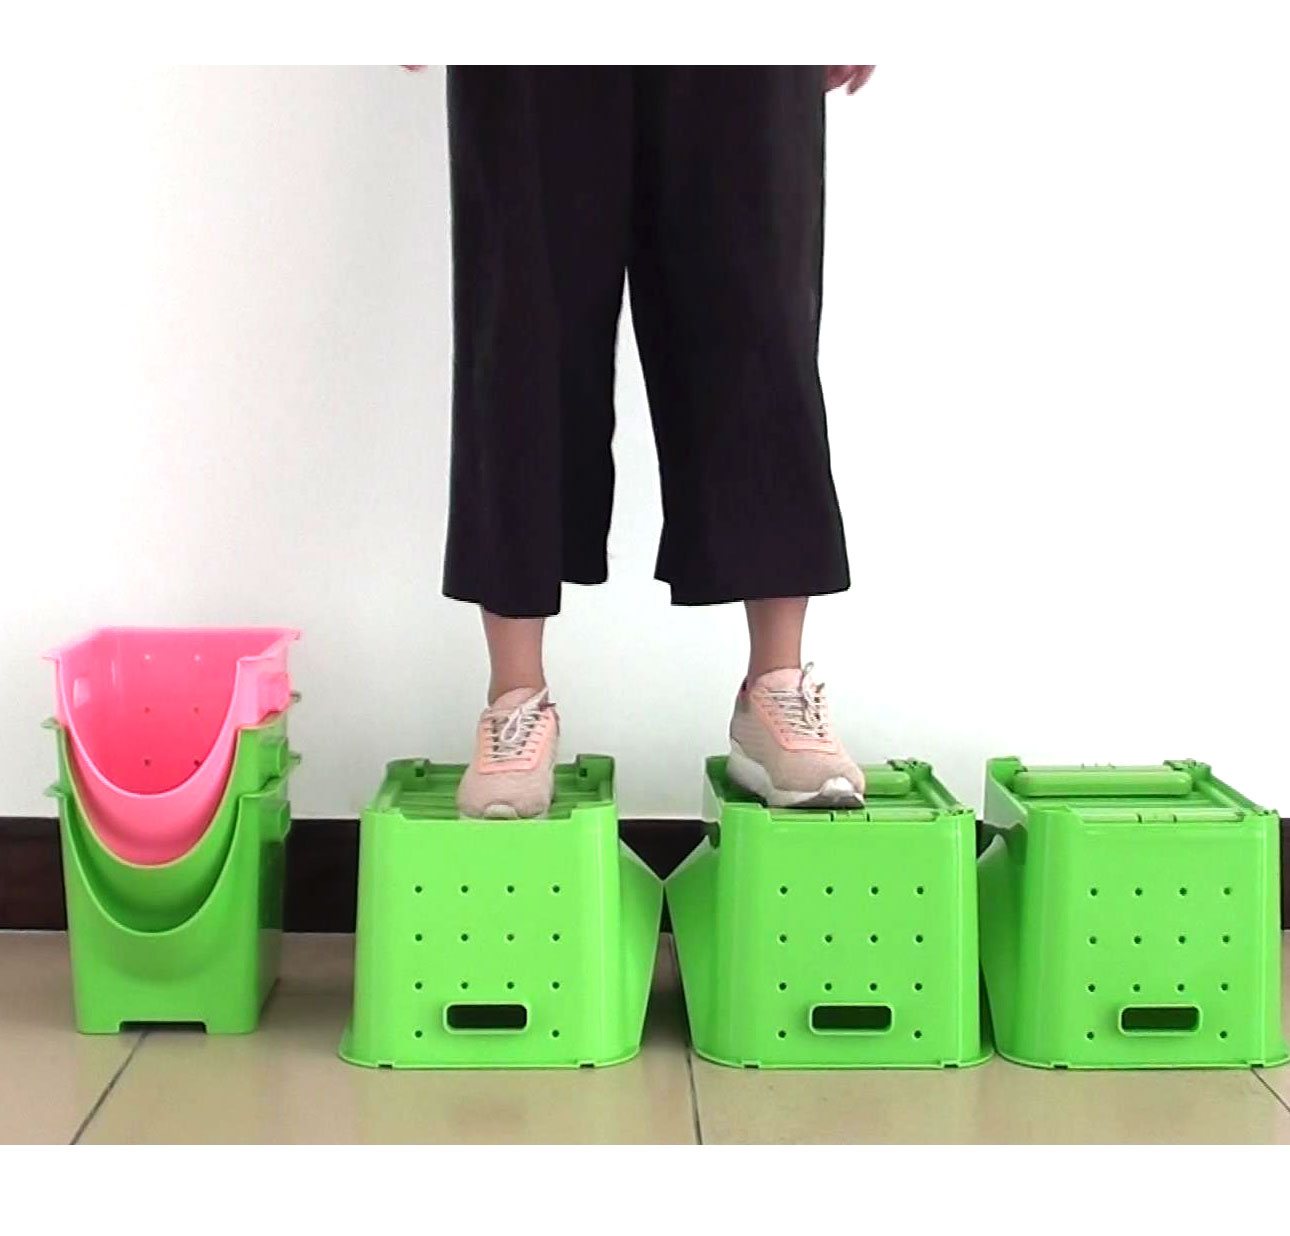 Fruit Vegetables Books Toys Clothing Multi-Function Plastic Storage Basket